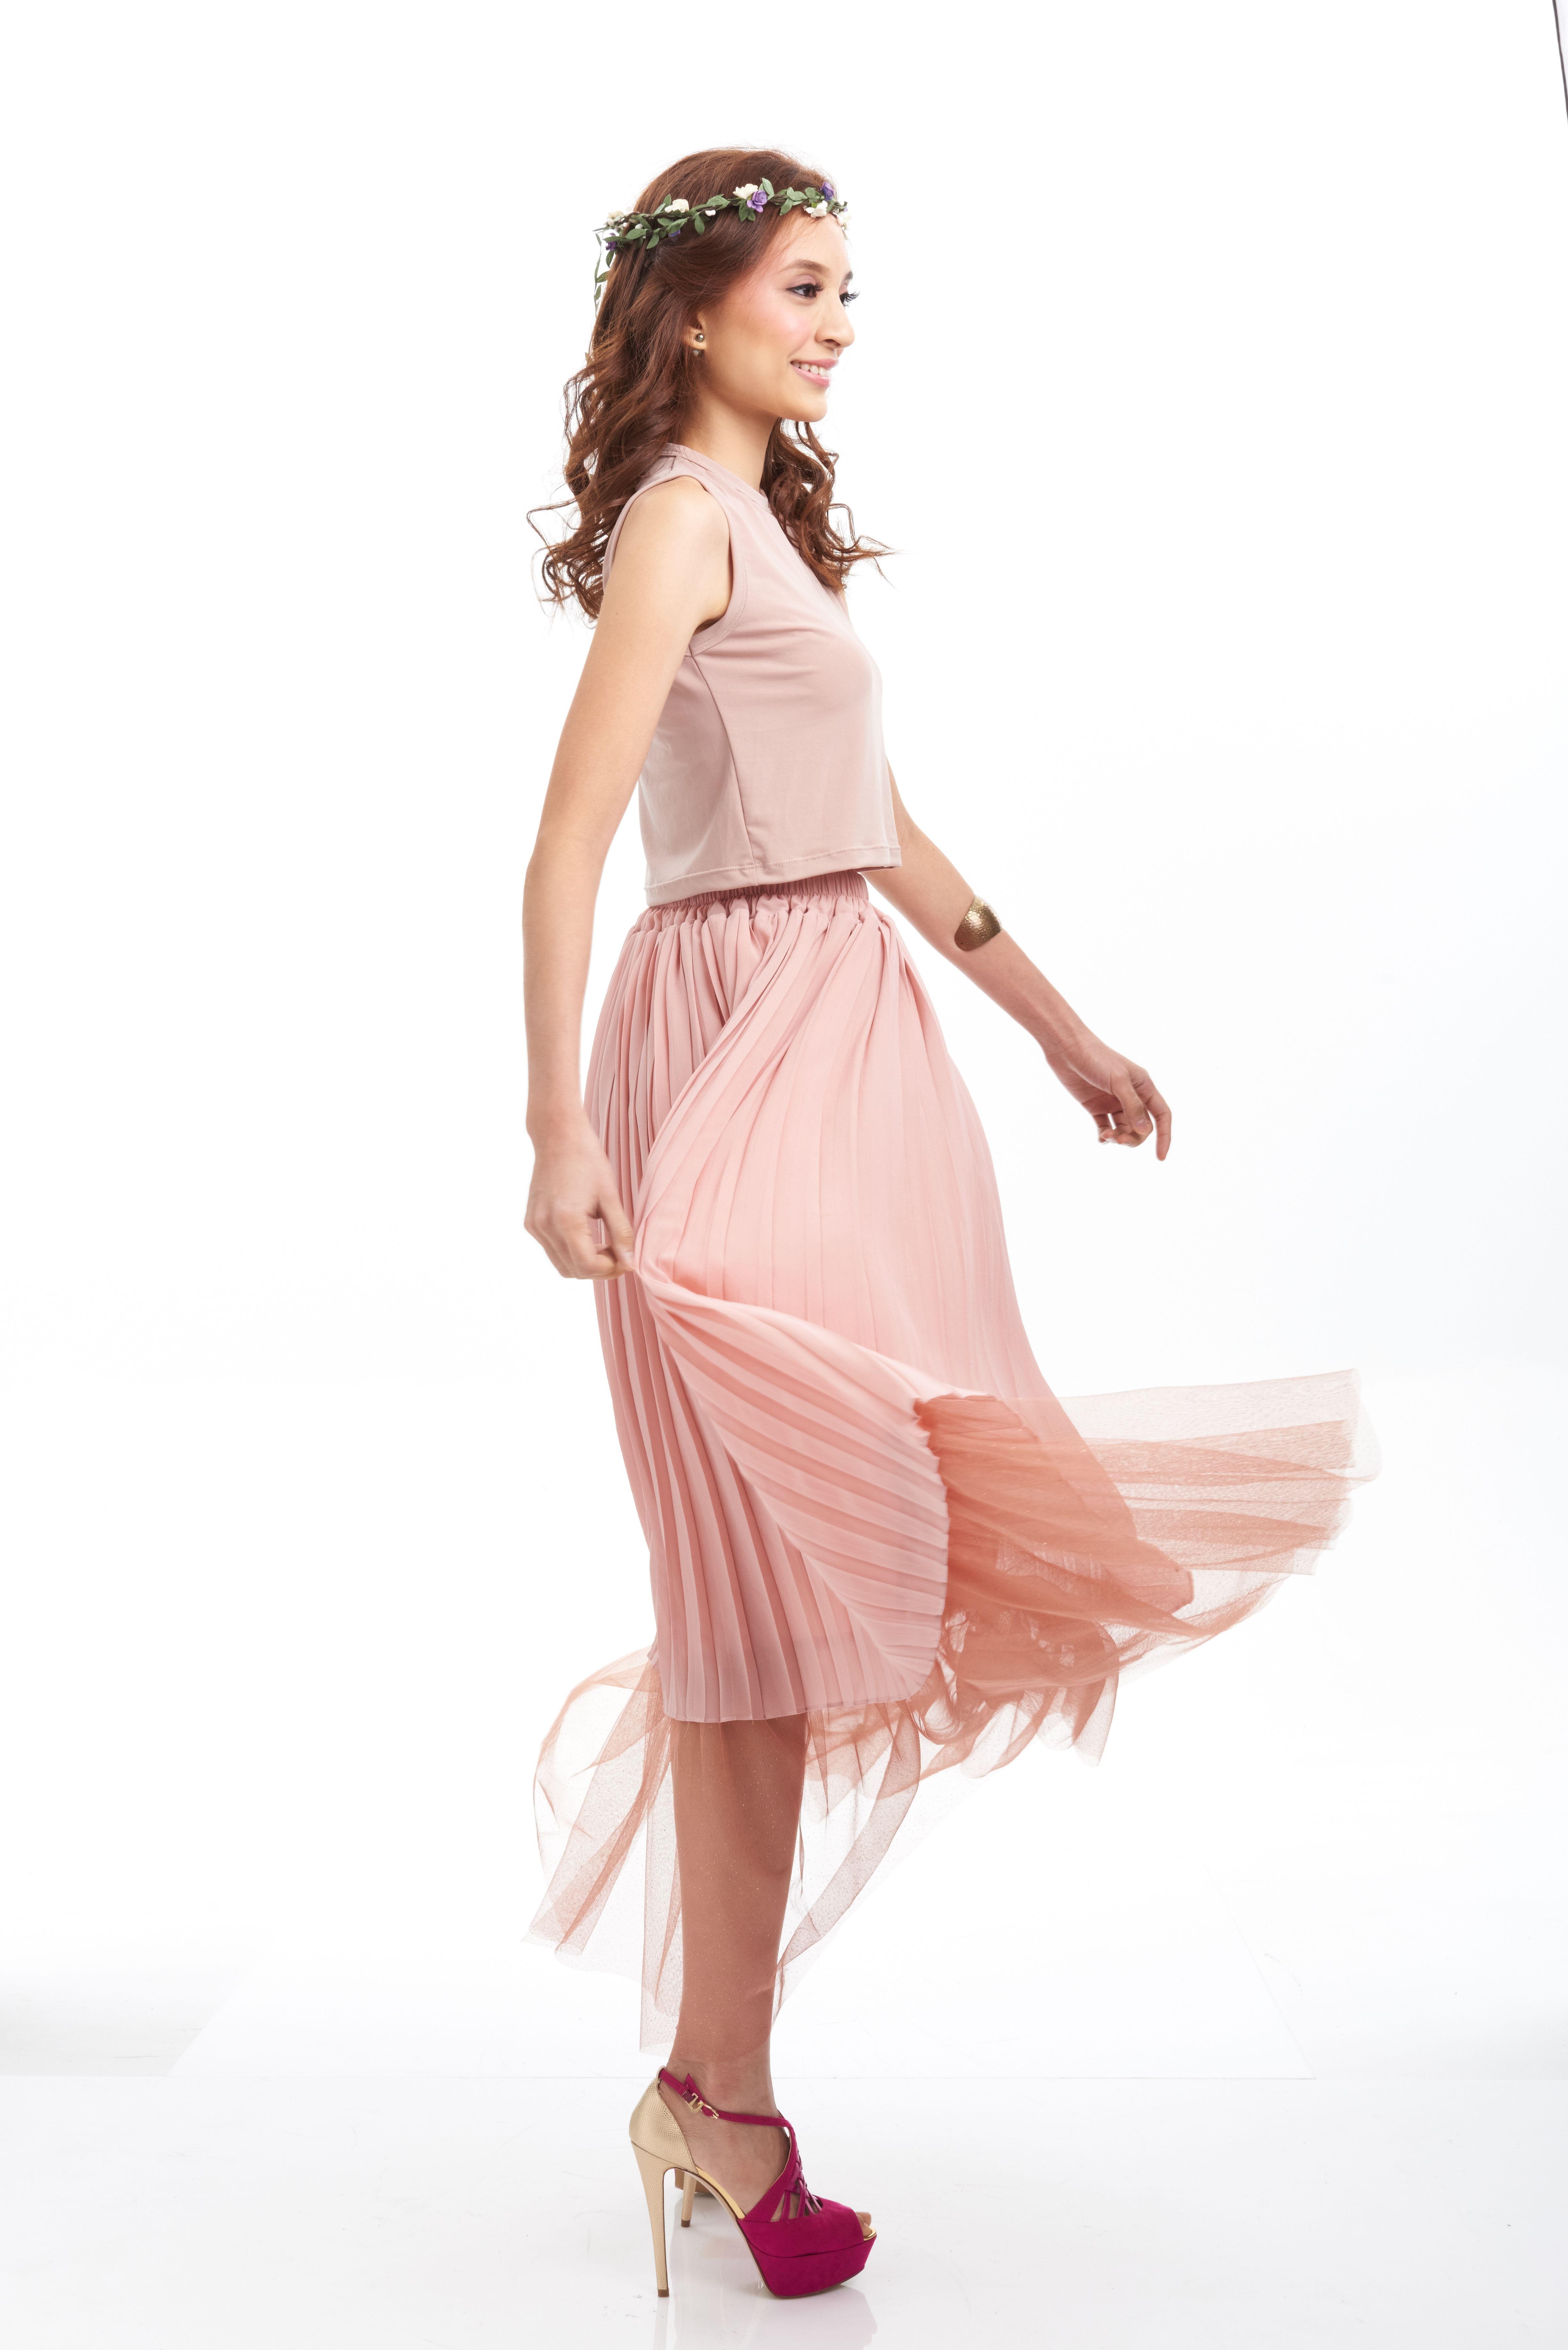 A little bit of pink to brighten the day, and blow the clouds away  #stylebysyaxseacitizen #seacitizencom  http://www.sea-citizen.com/stylebysya-carnation-blush-tulle-skirt